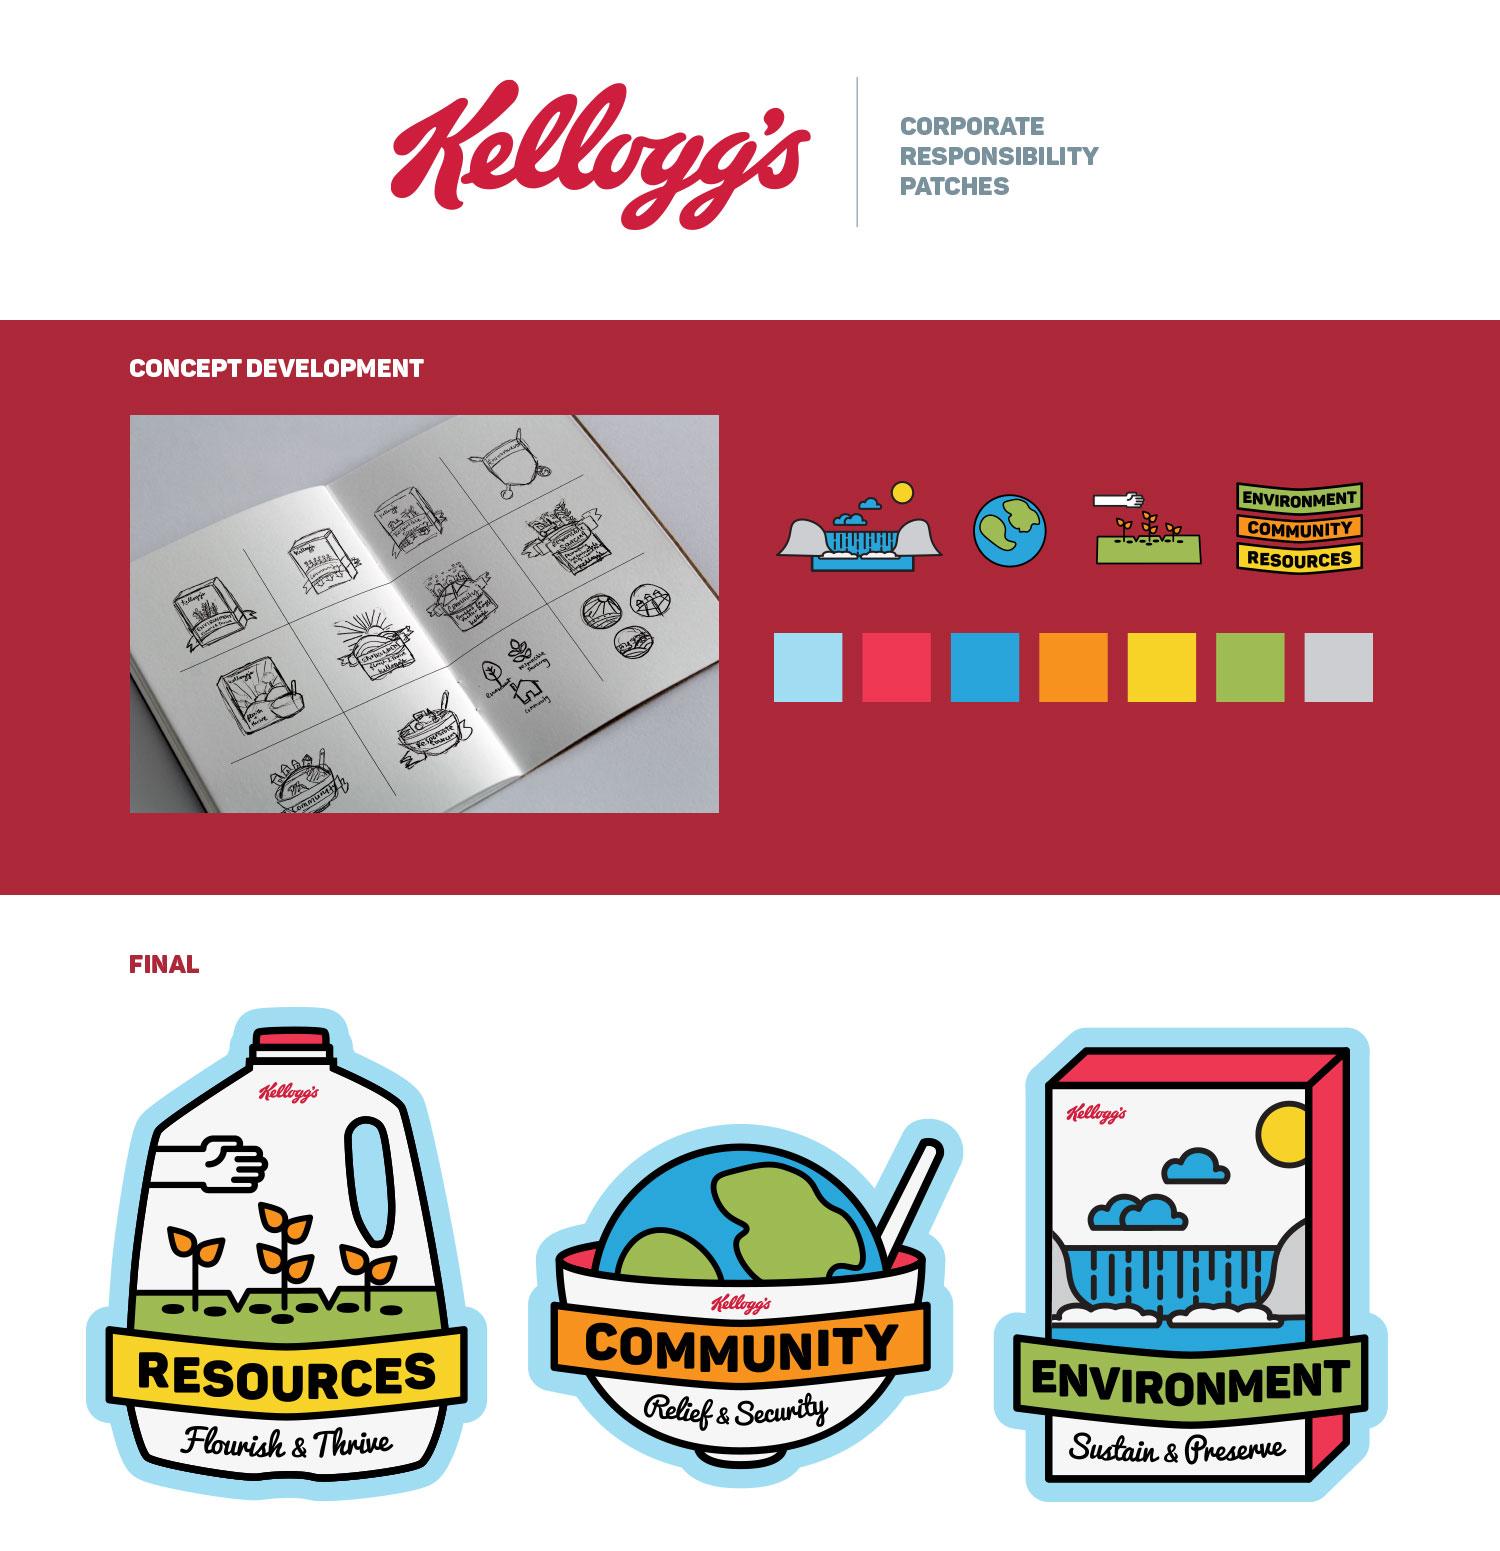 1_Kellogg_Company_concept_development.png